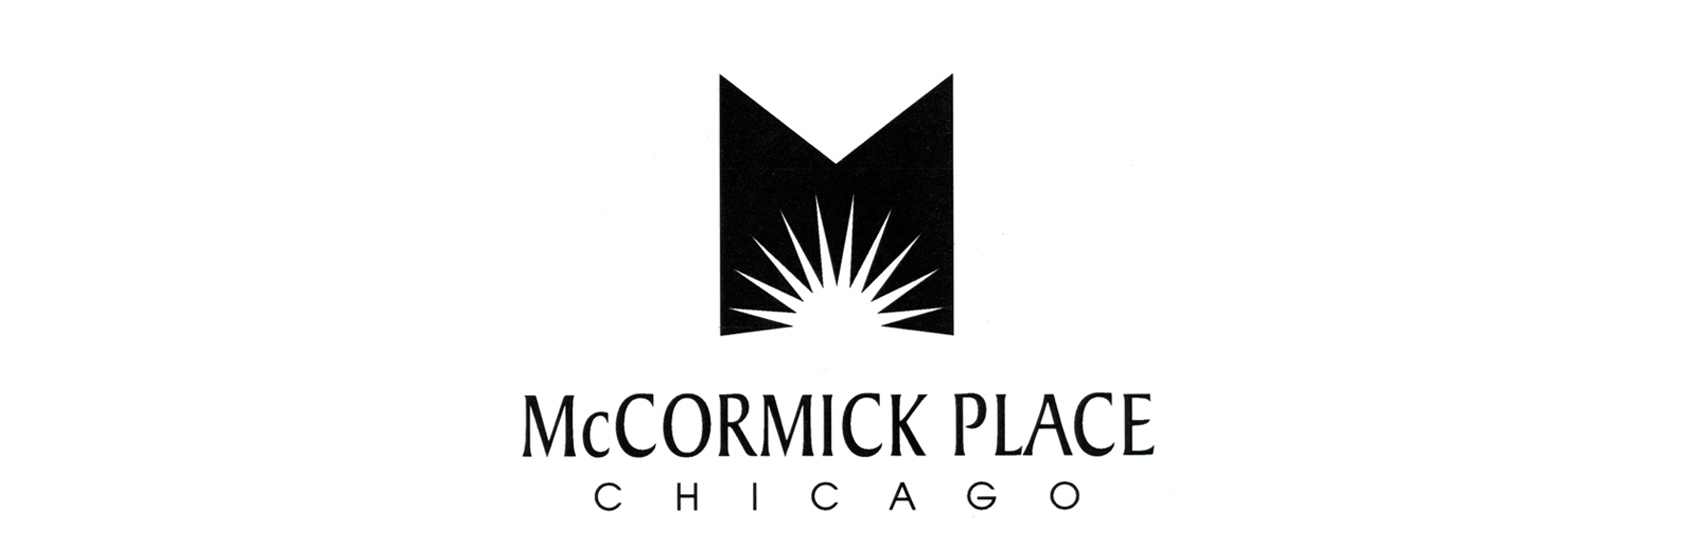 Logos1mcCormick.jpg